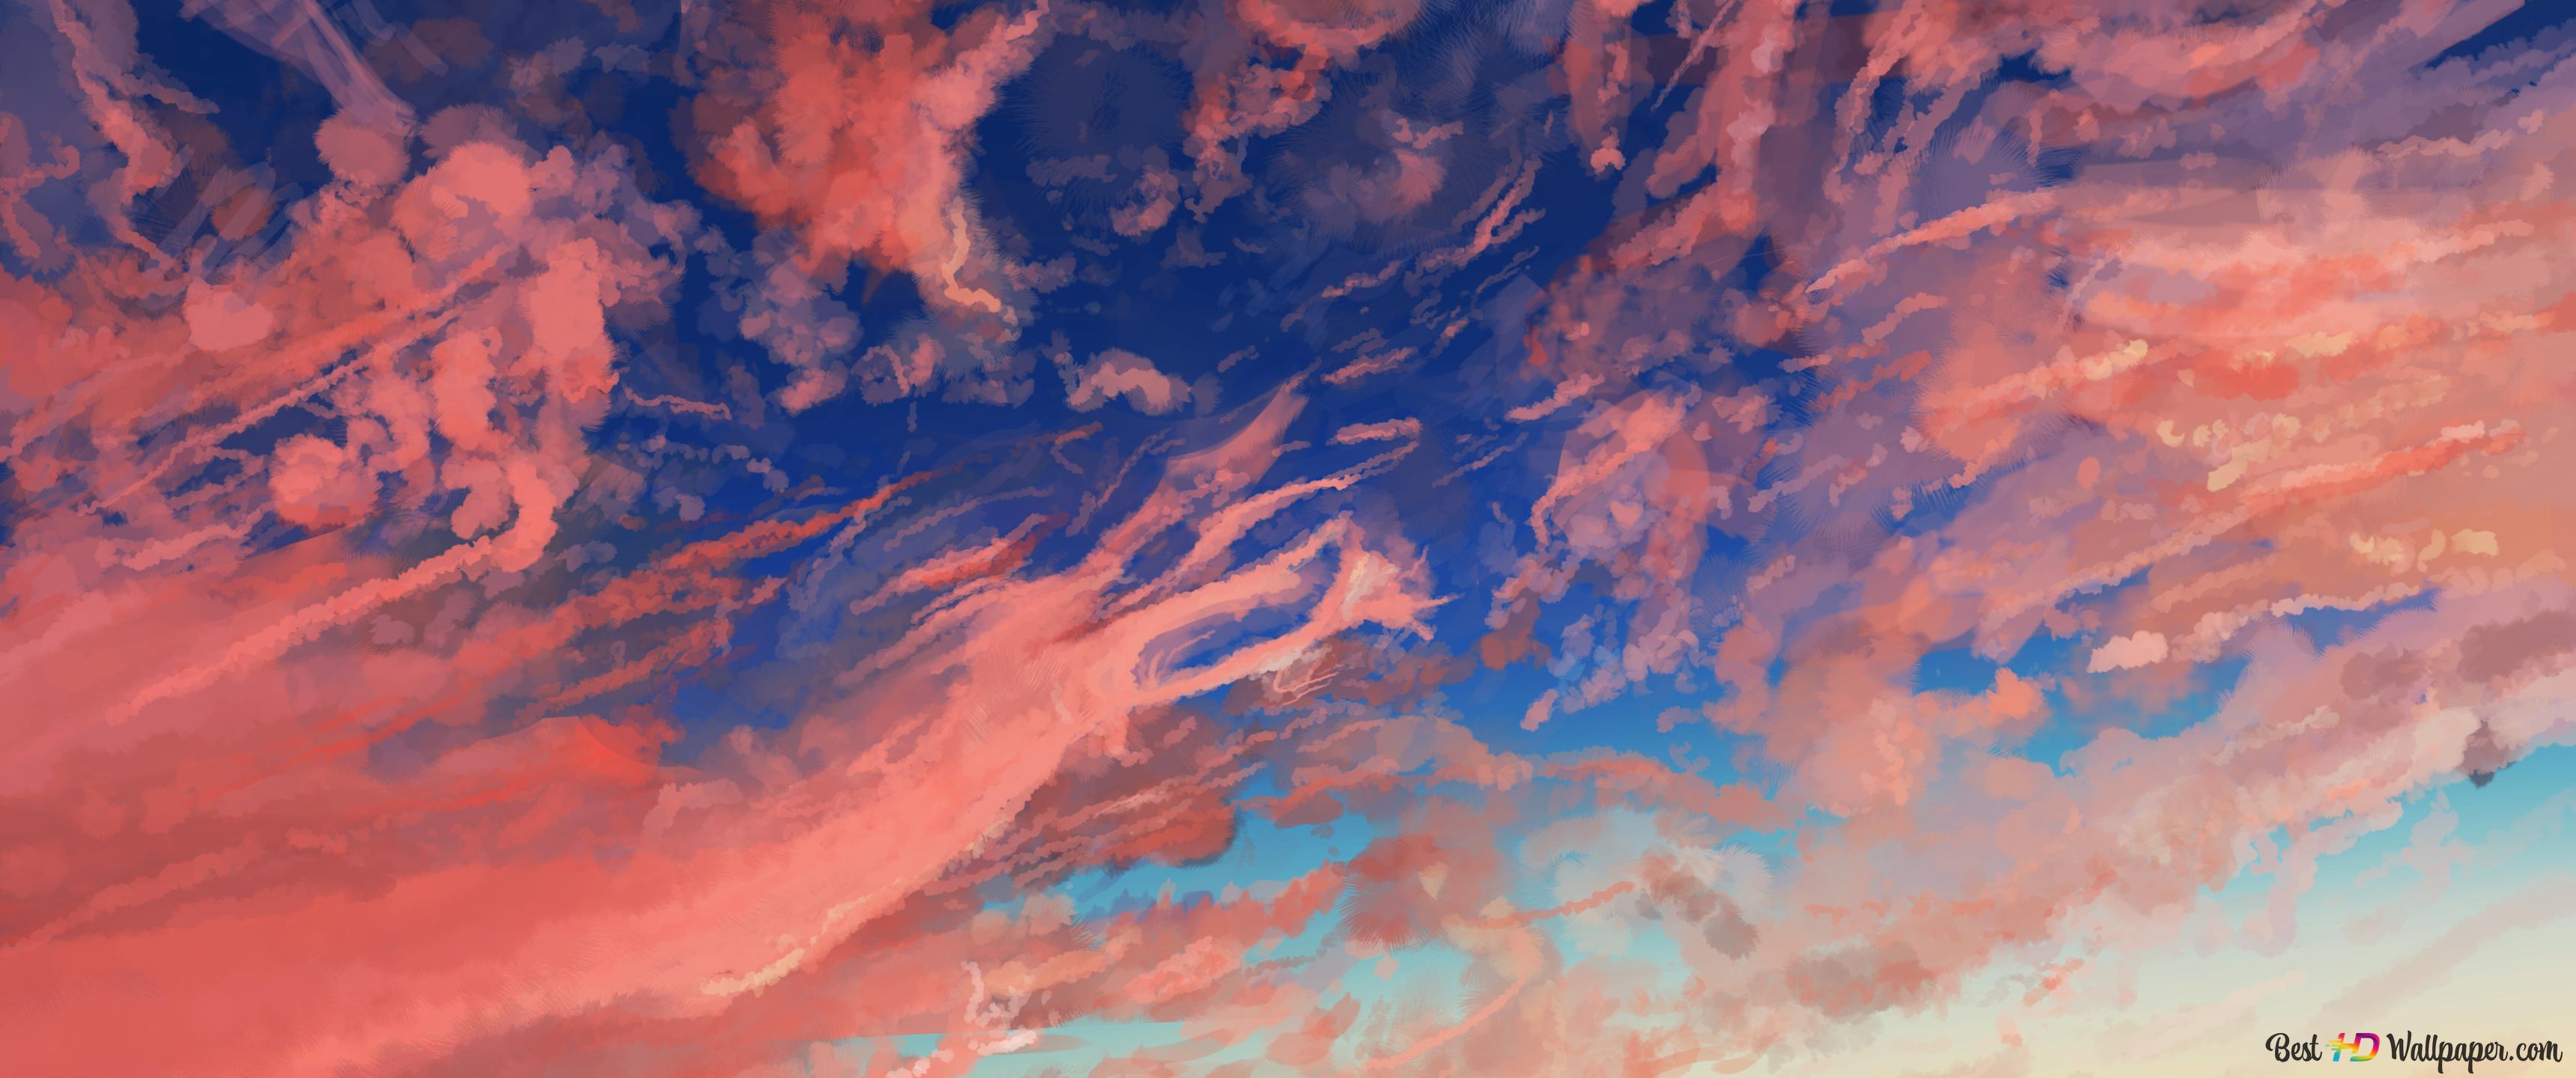 Cloud Sky Anime Hd Wallpaper Download